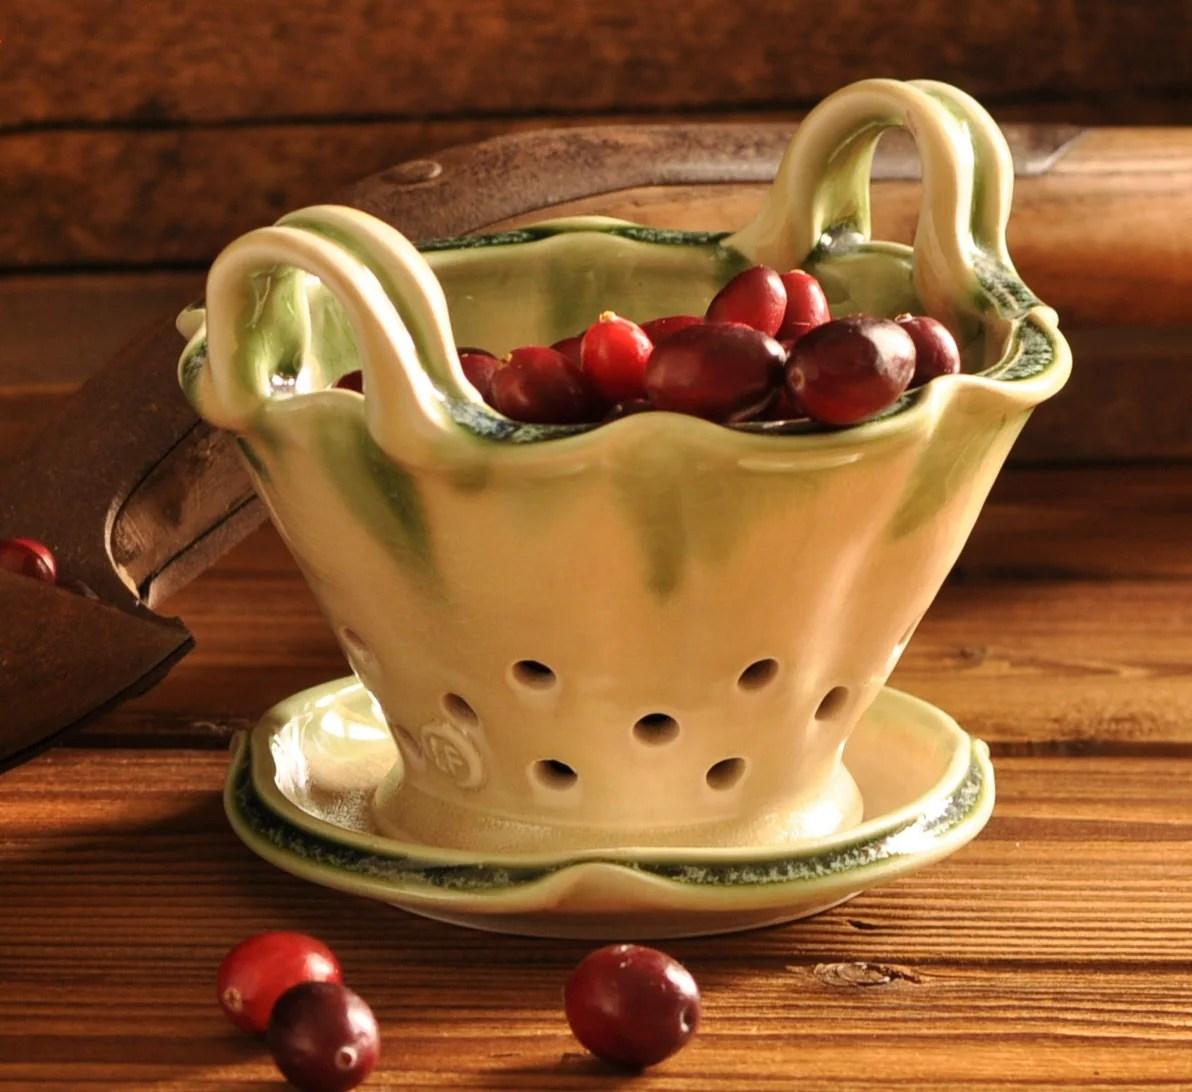 Bowl Colander Plate Berry